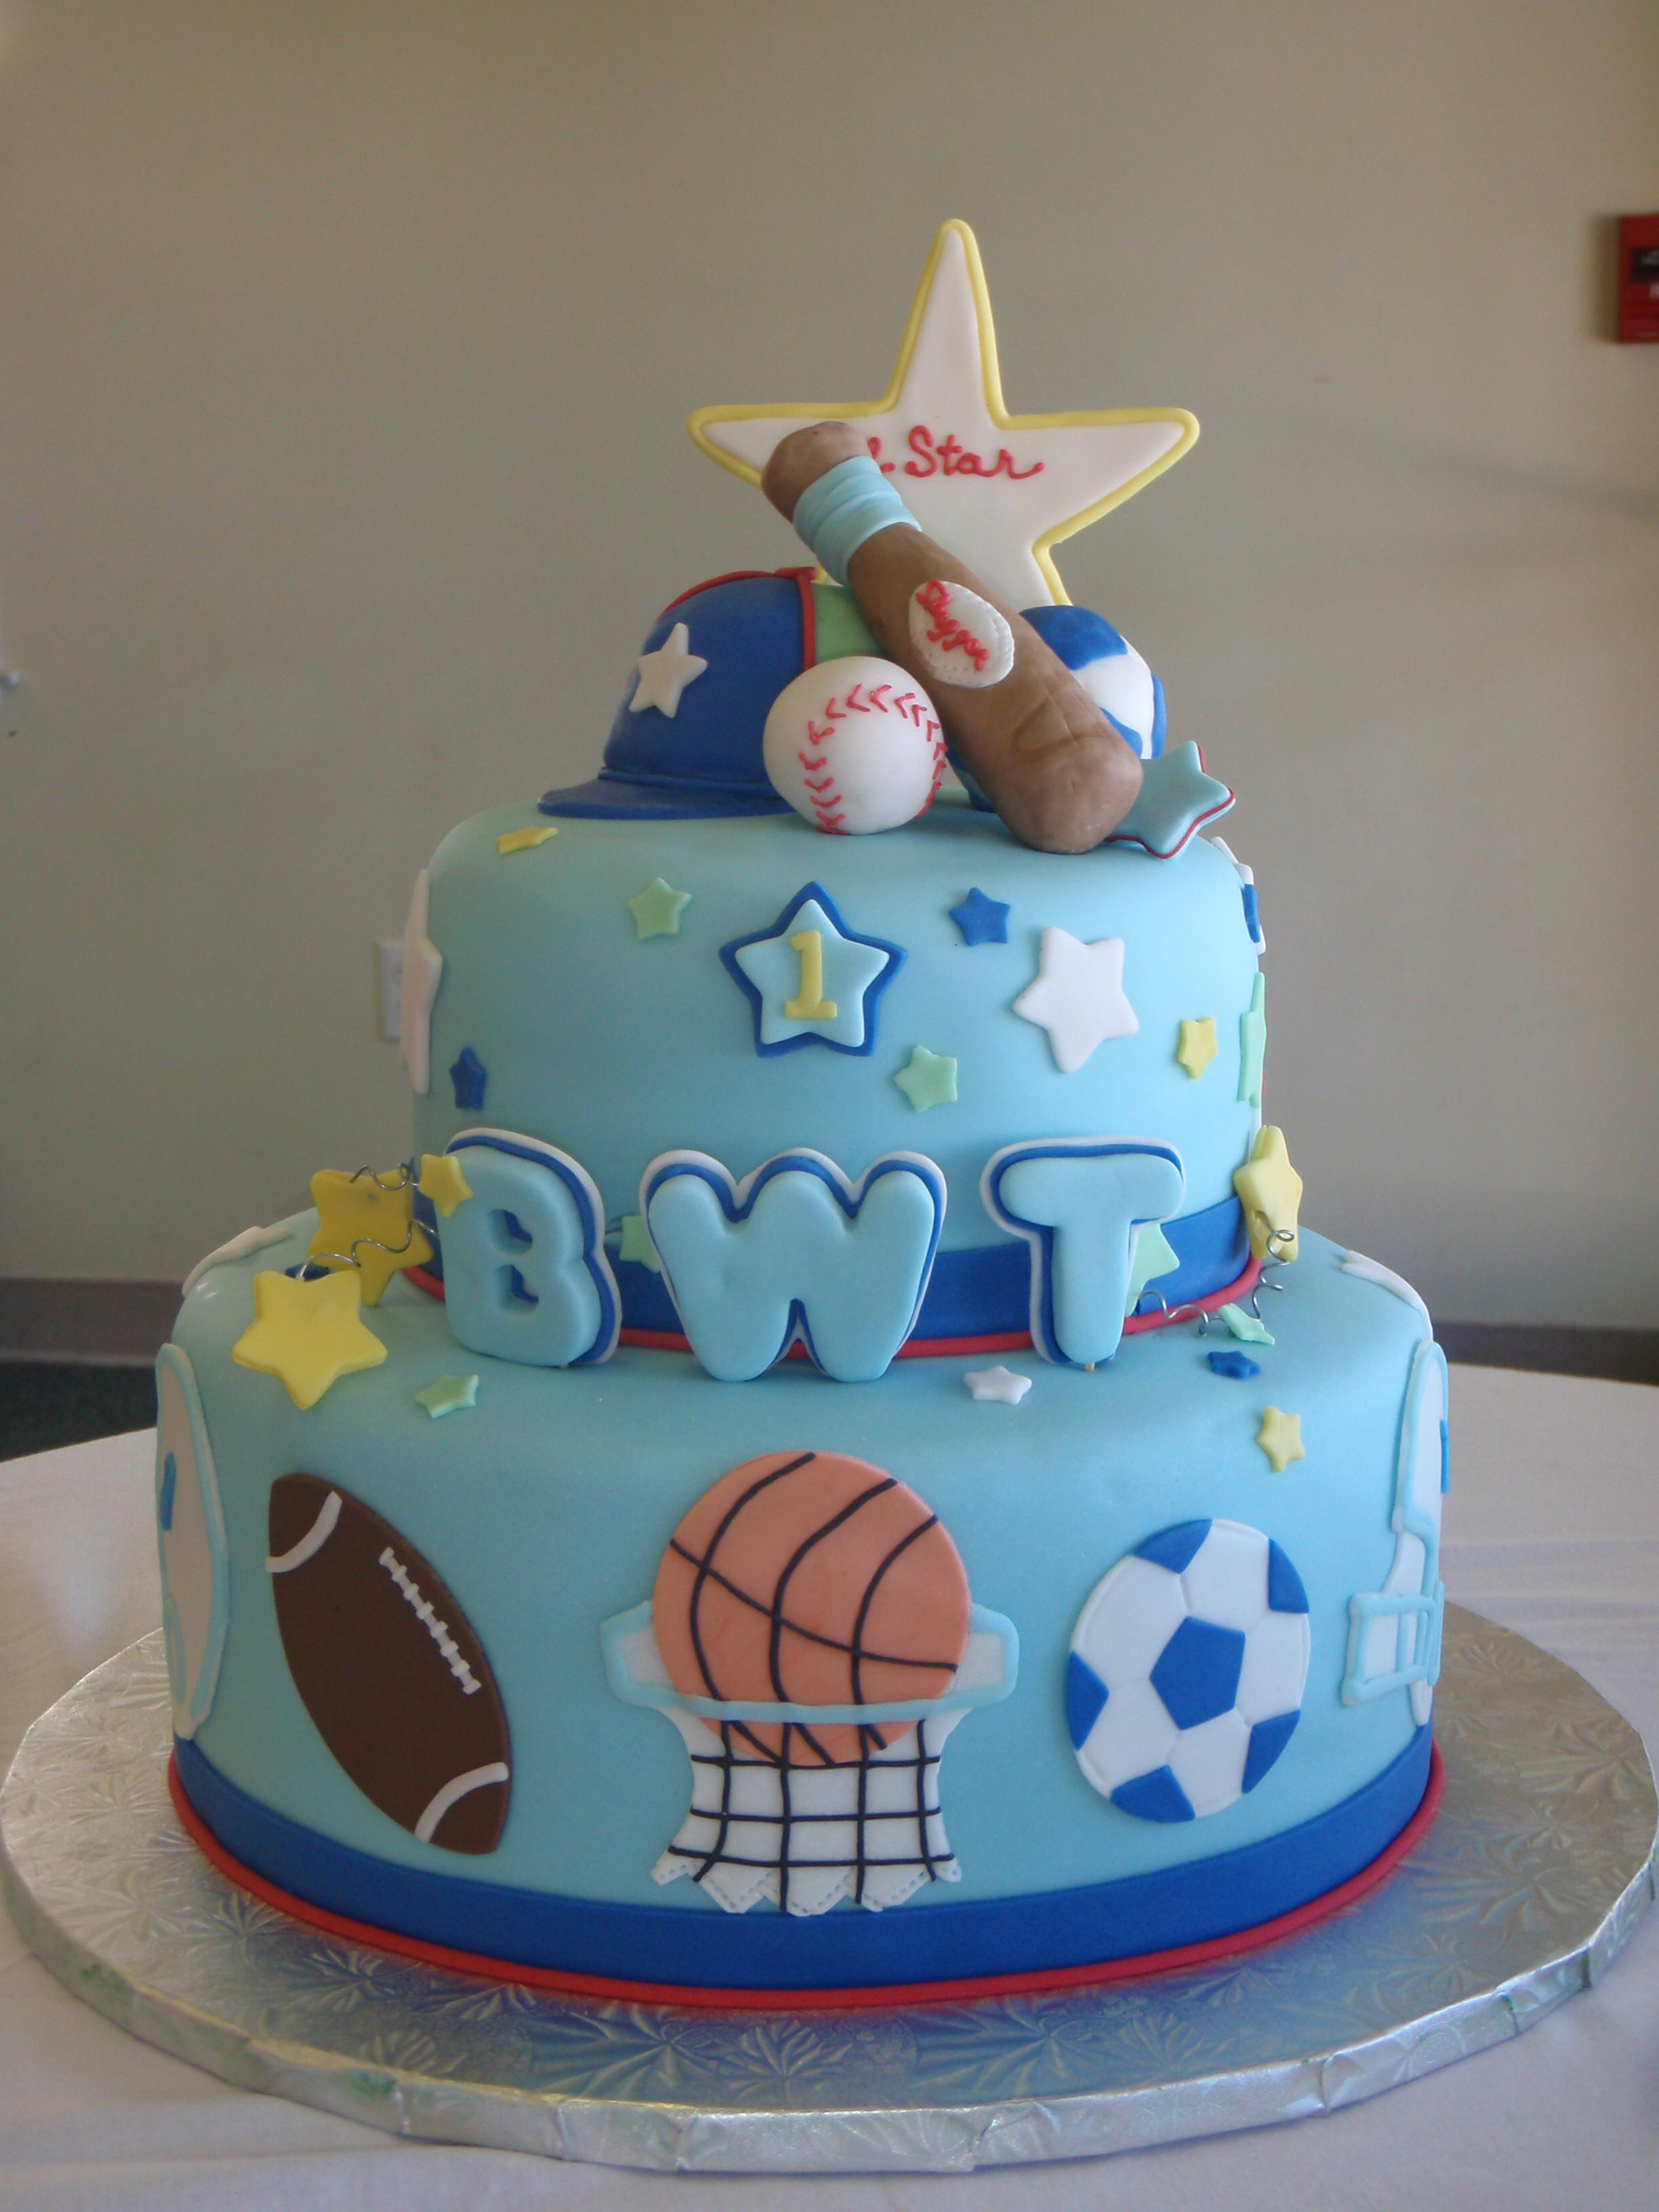 Baby boy sports cake & Baby boy sports cake | Sports | Pinterest | Cake Babies and Birthdays